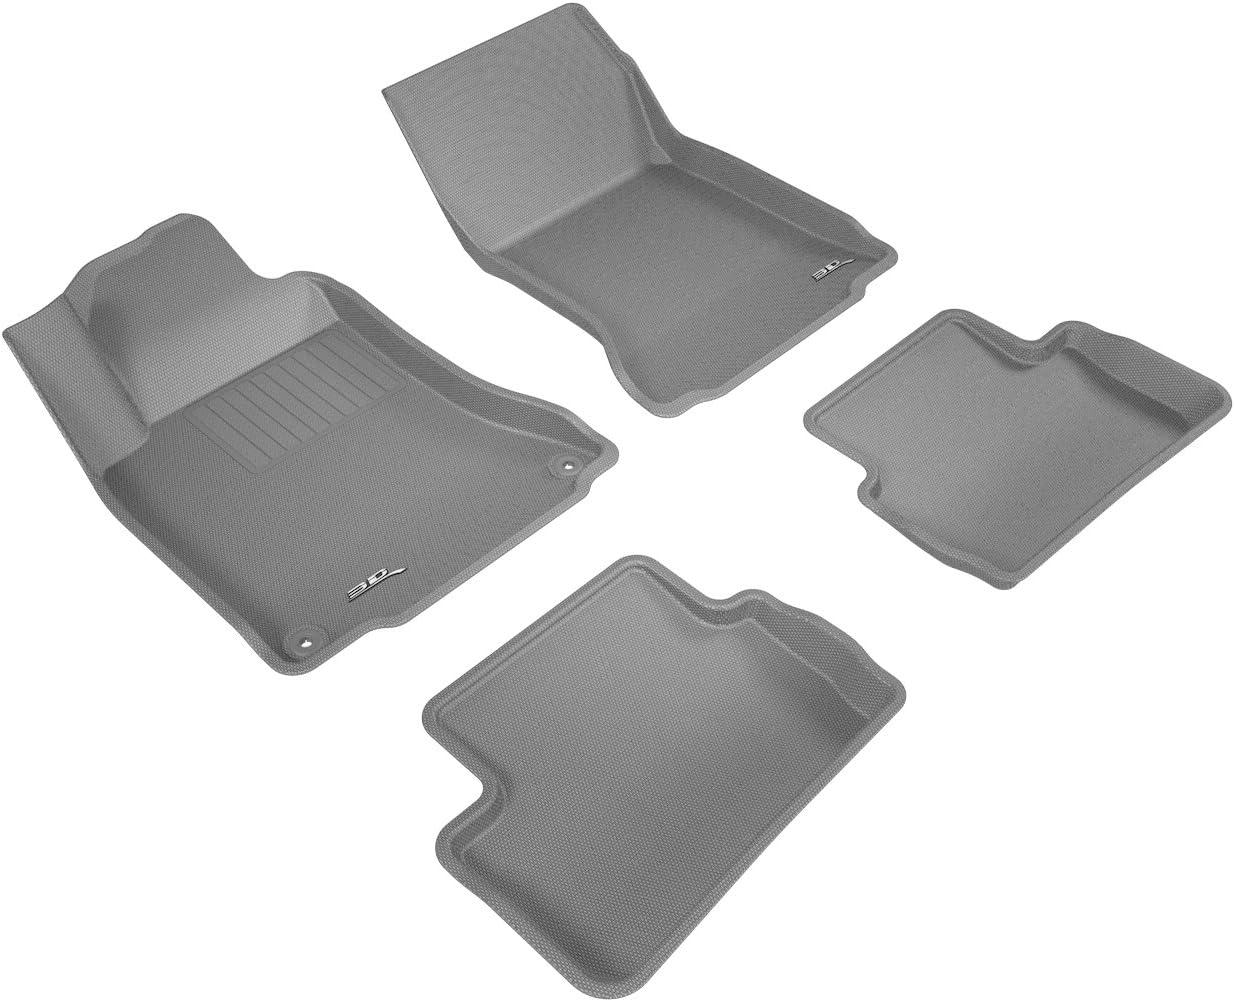 L1MB04801509 3D MAXpider Complete Set Custom Fit All-Weather Floor Mat for Select Mercedes-Benz GLA-Class Models Kagu Rubber Black